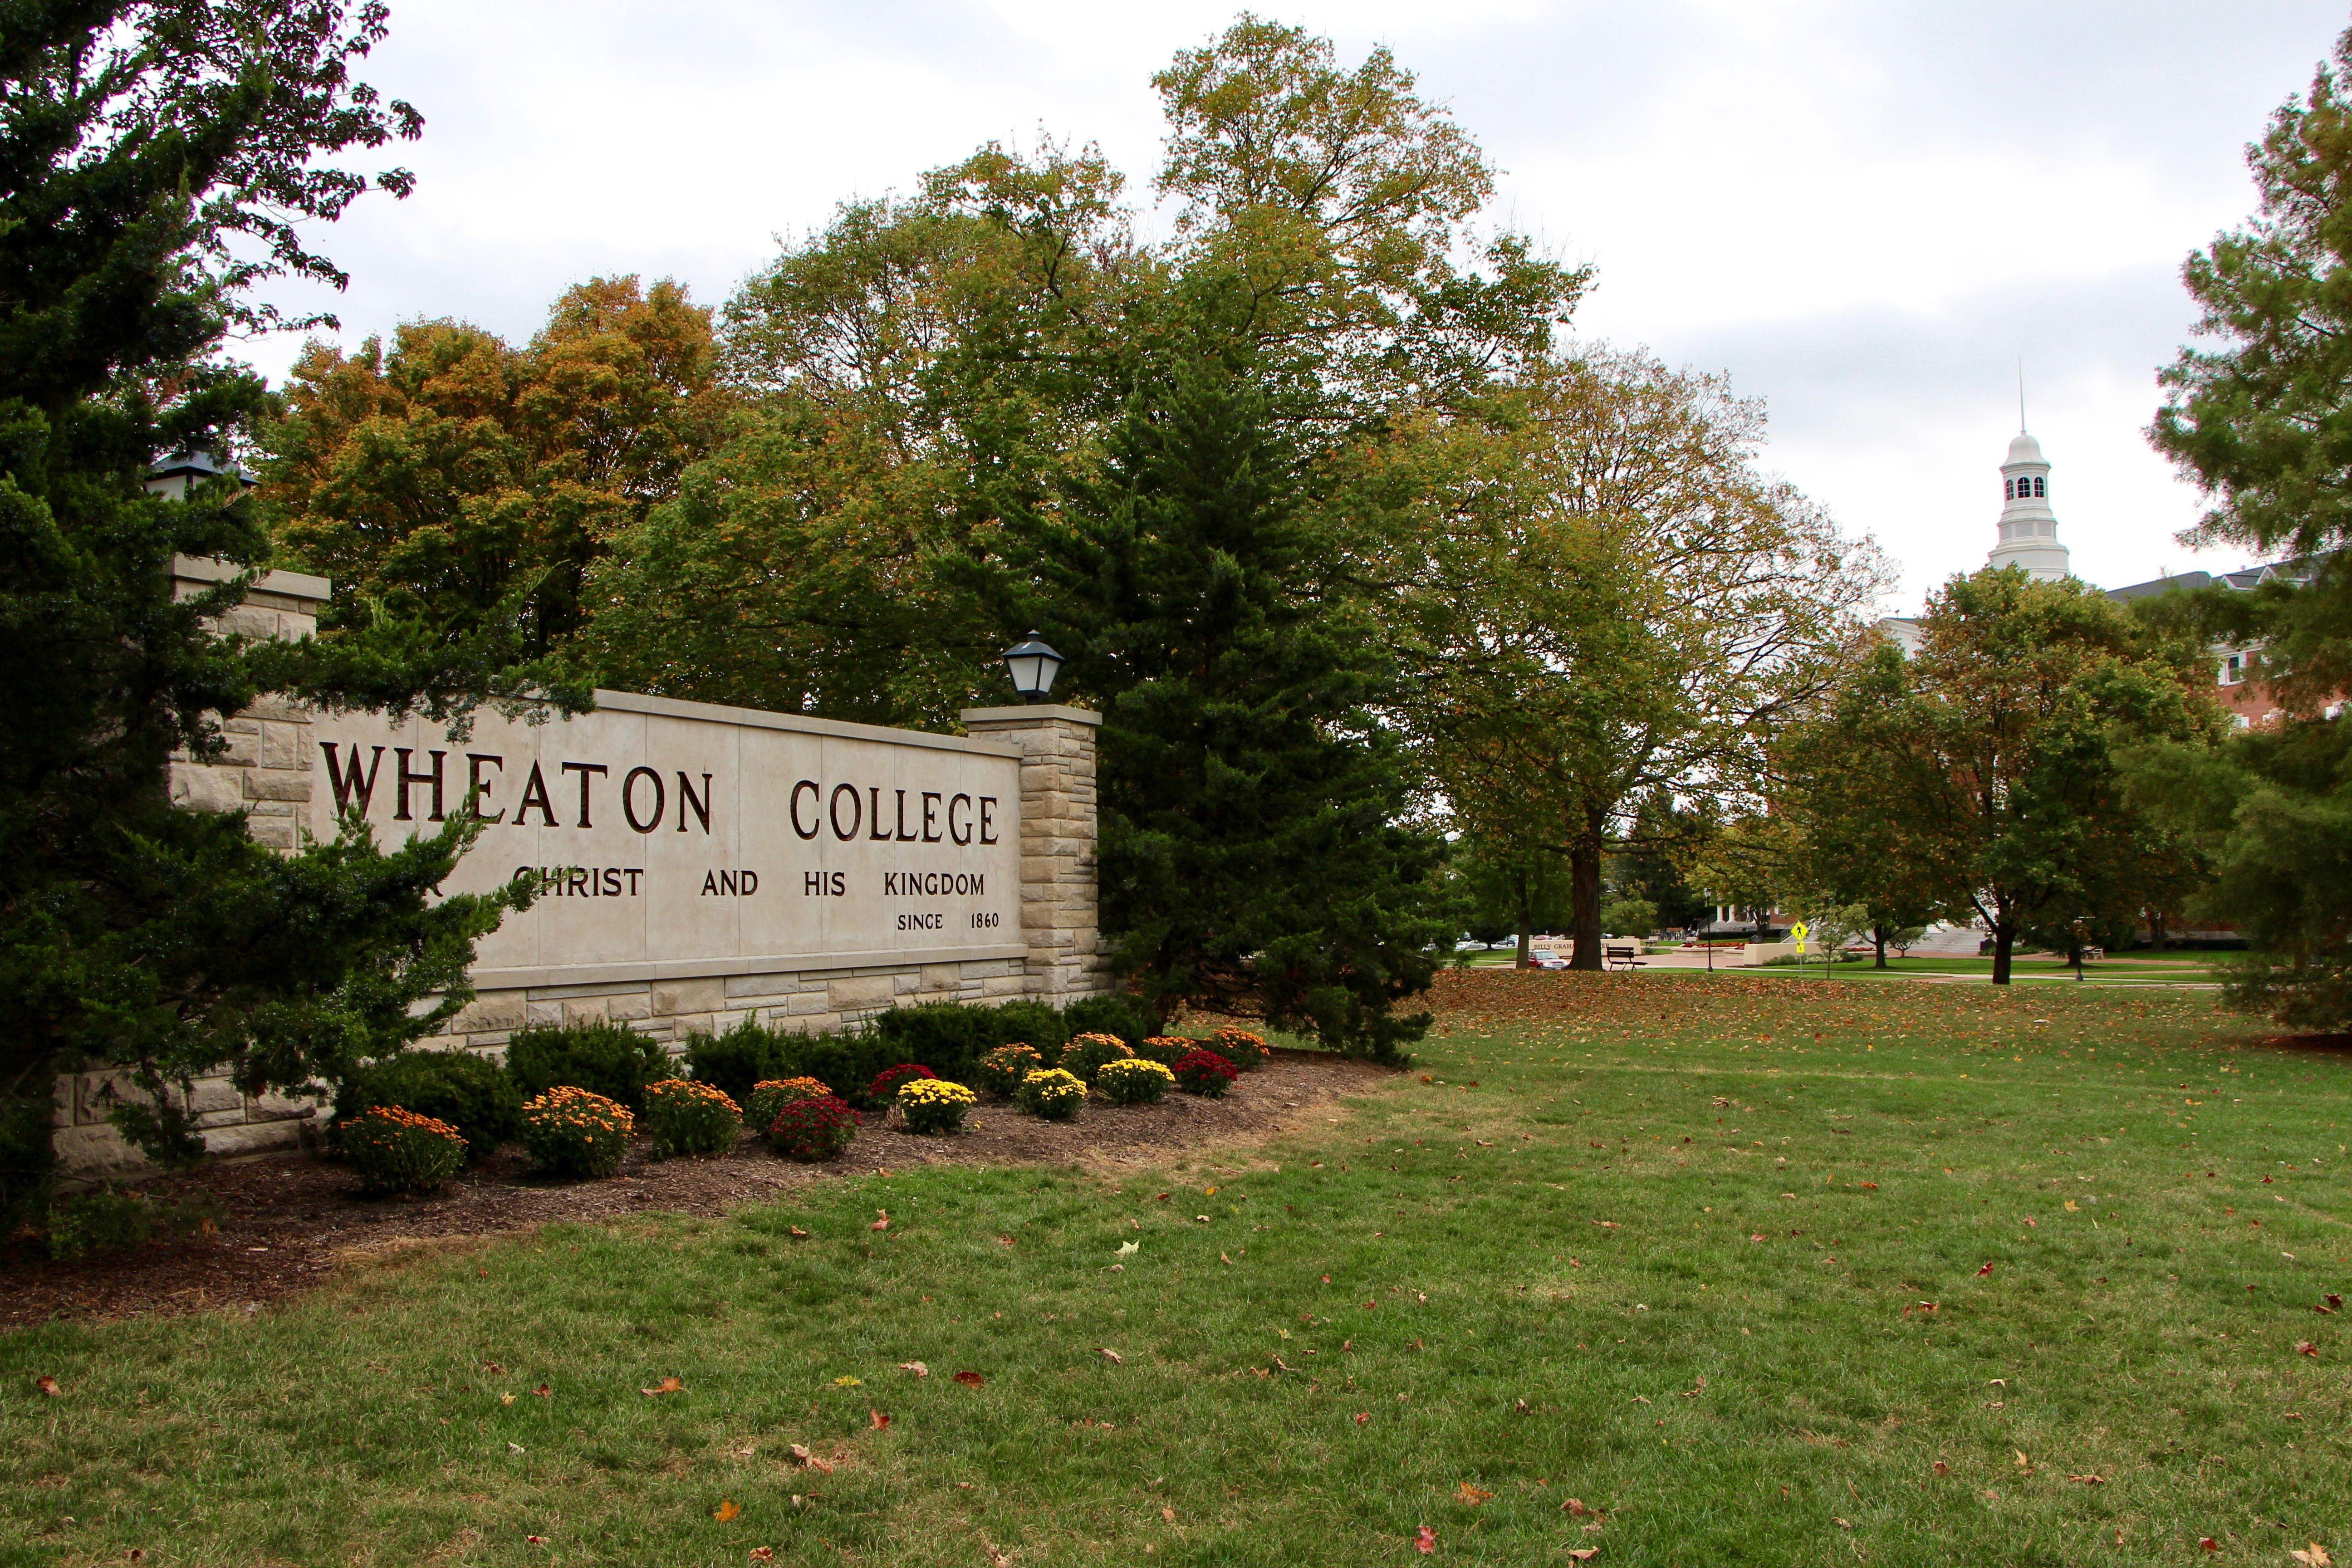 Wheaton College in suburban Chicago on Oct. 11, 2017.